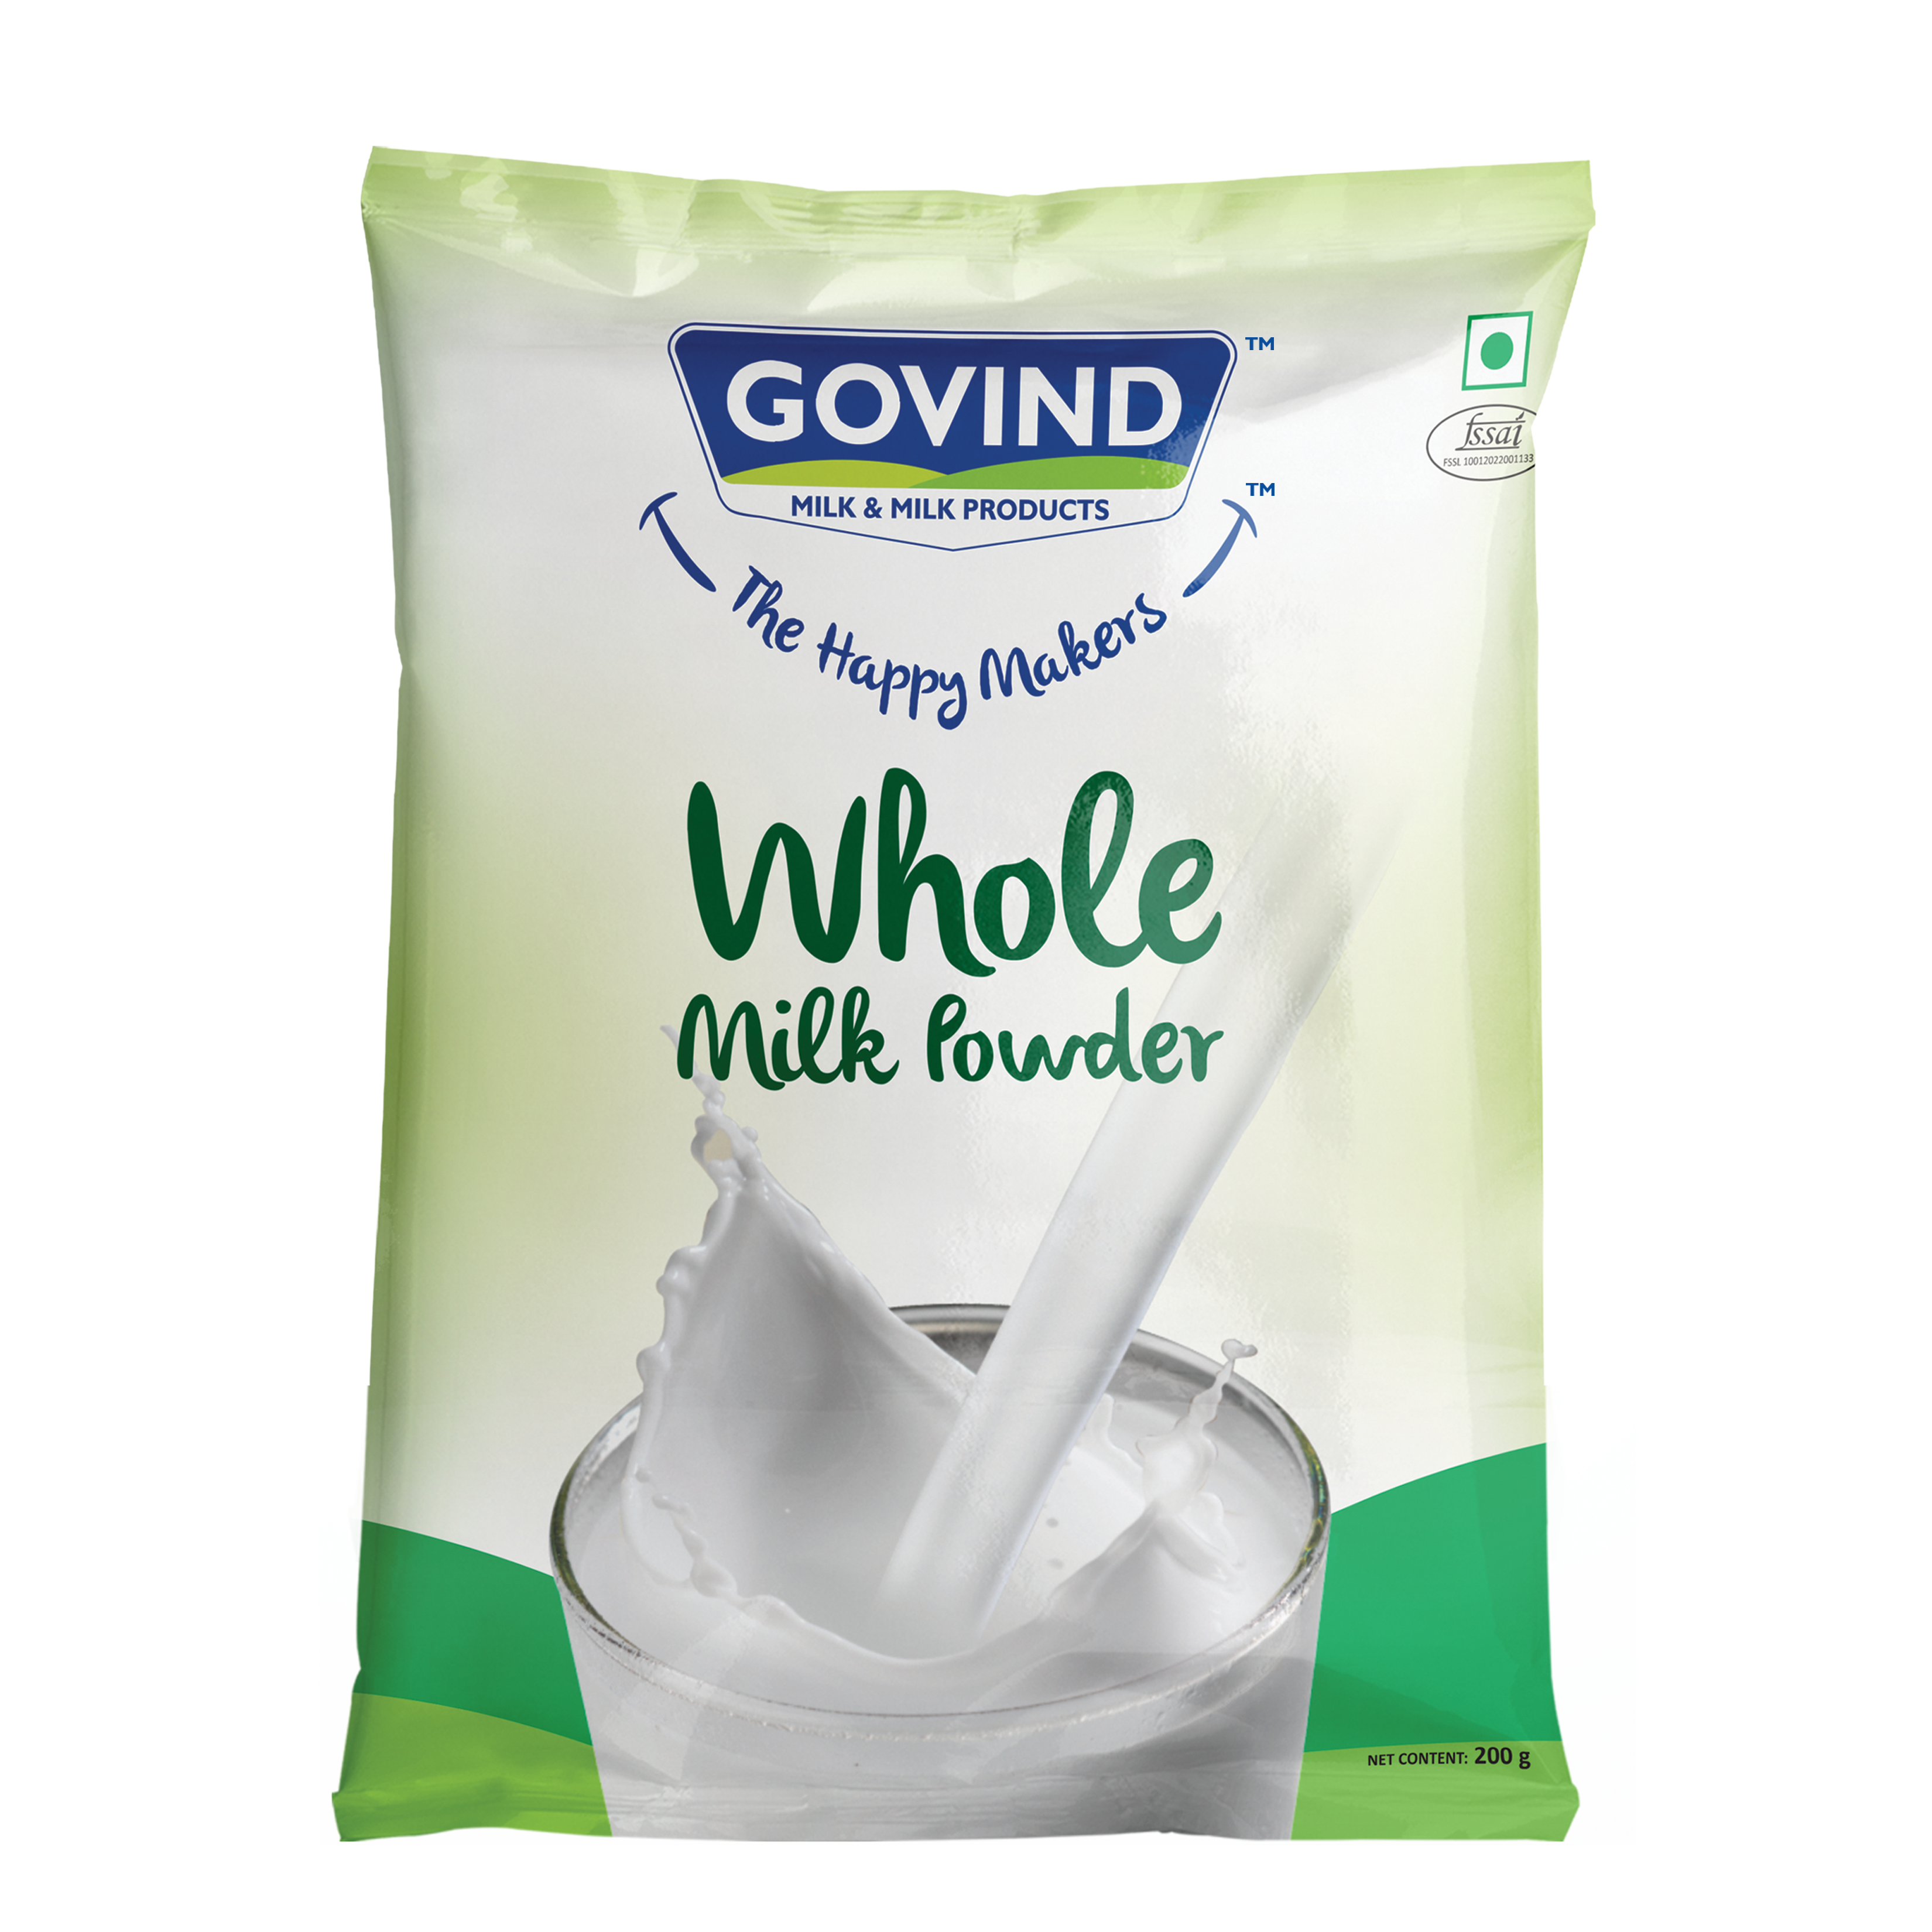 Whole Milk Powder by Govind Milk & Milk Products